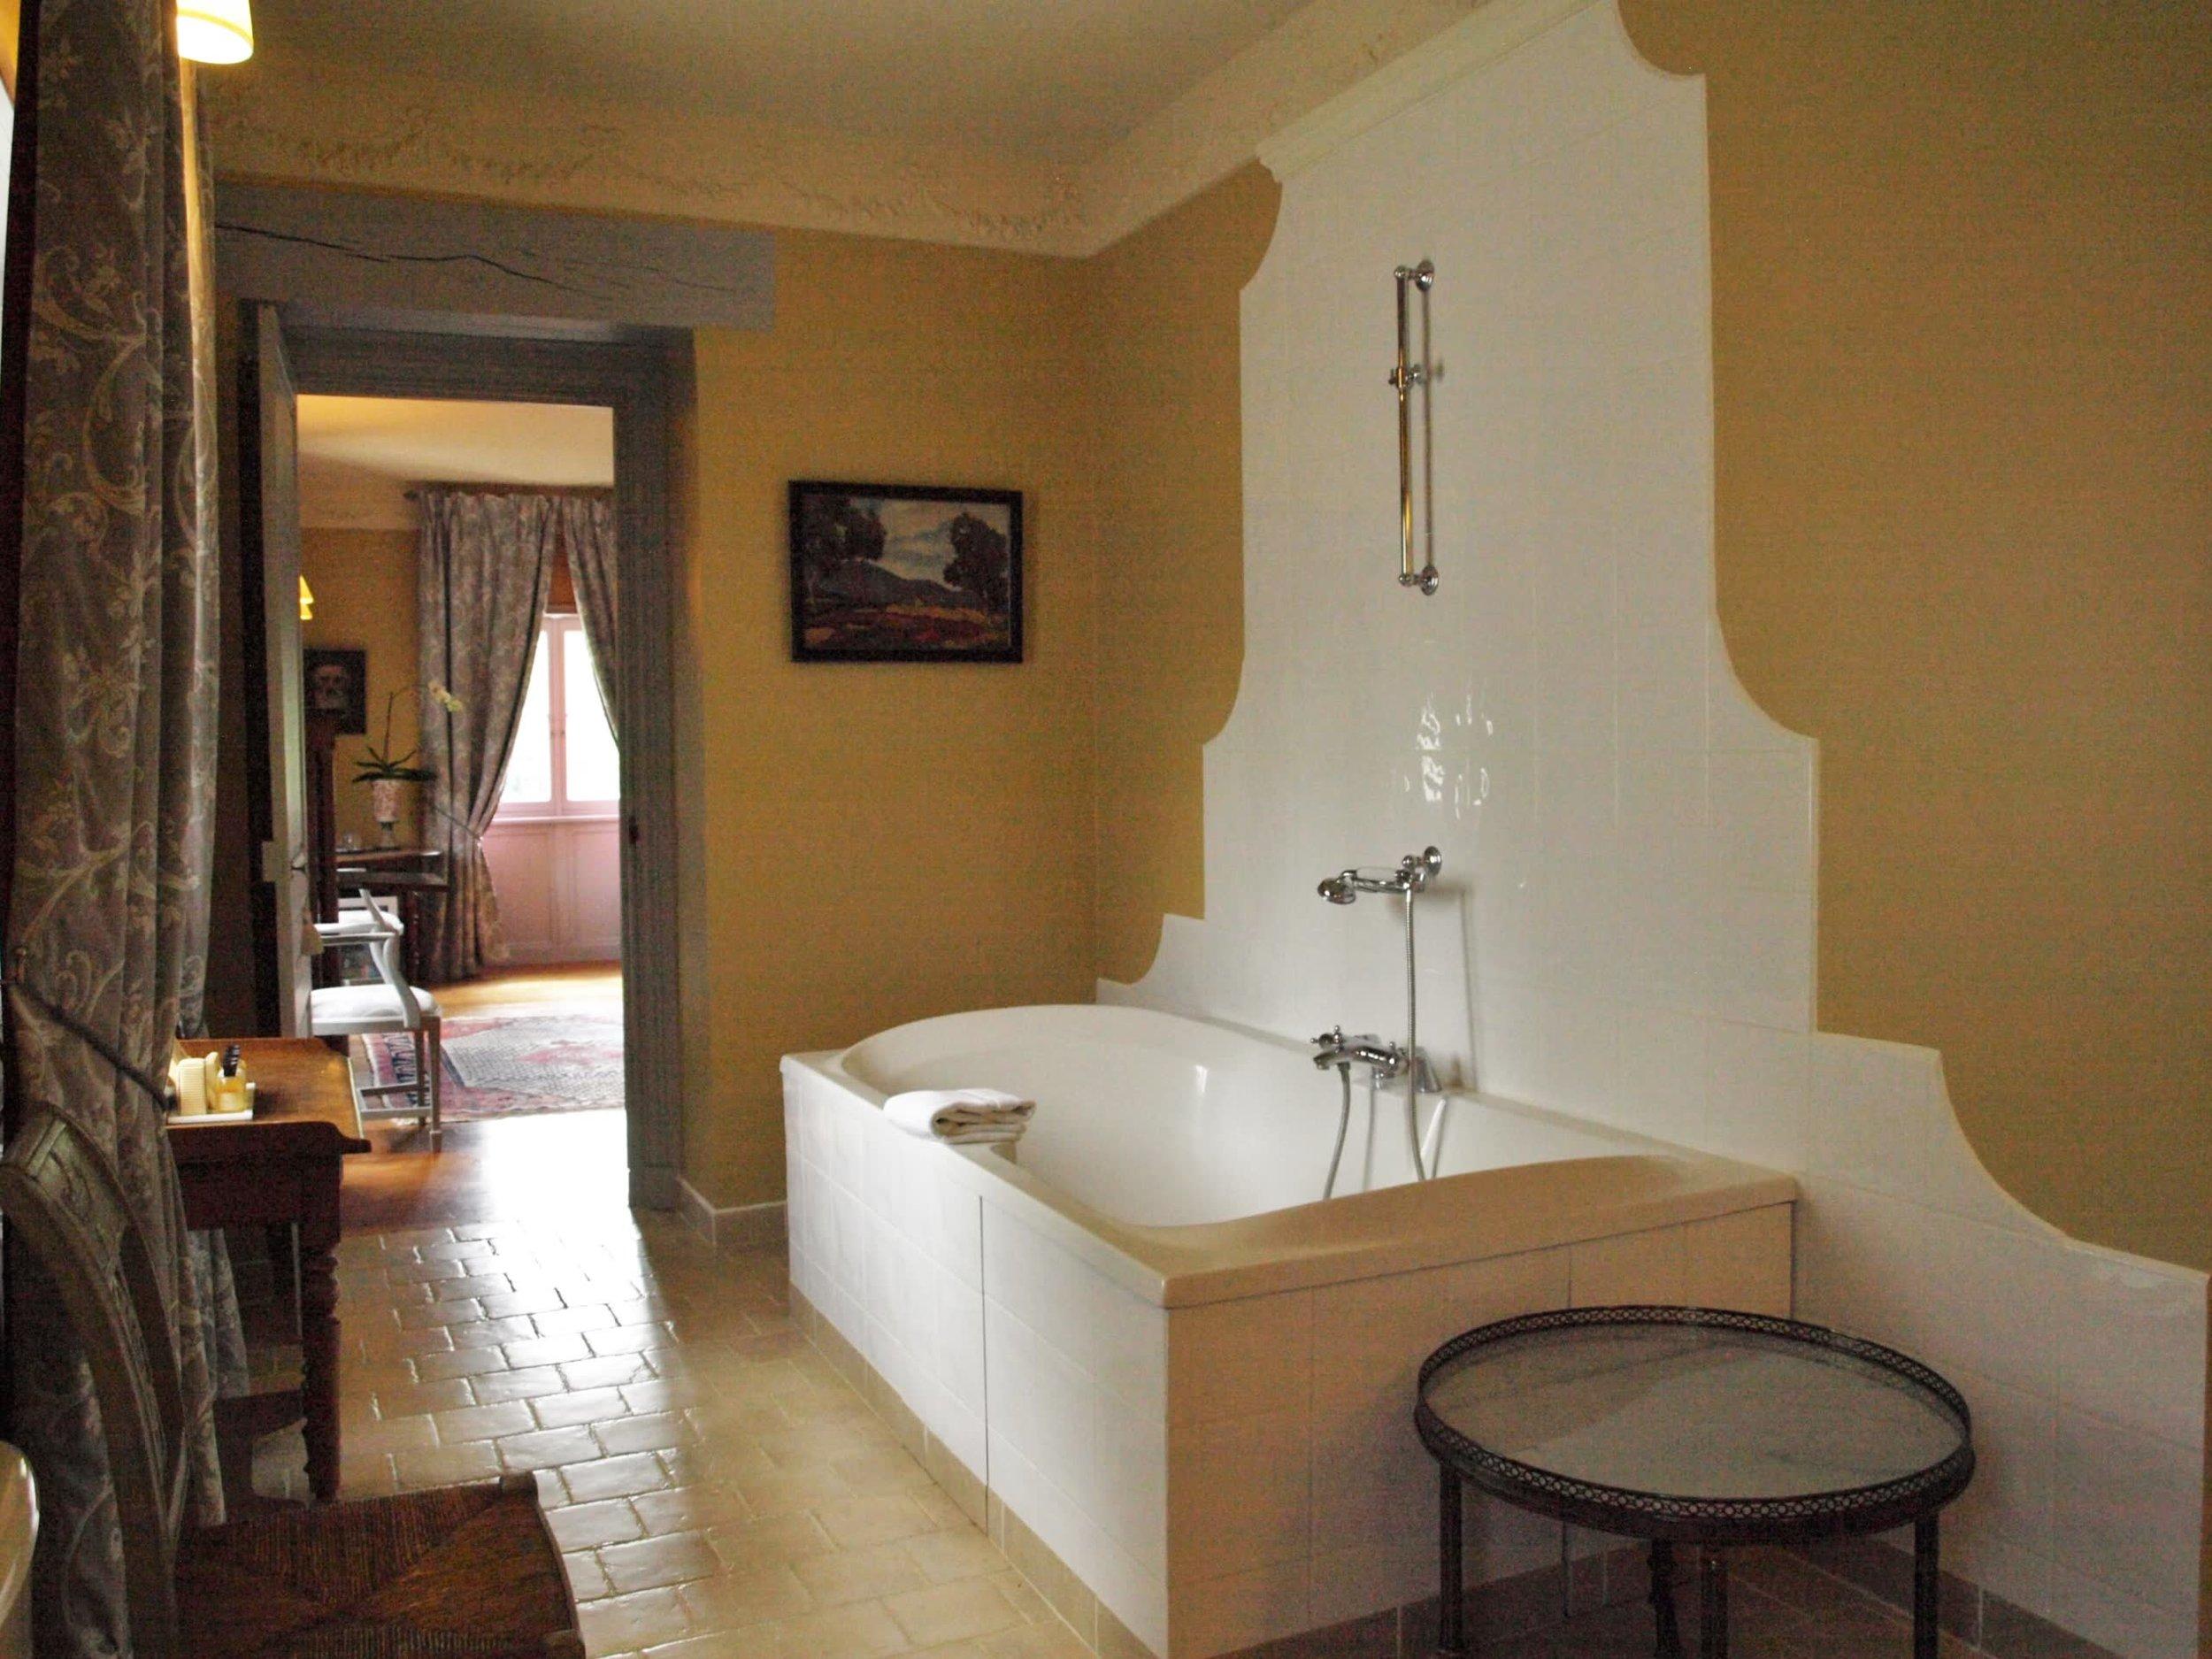 Chateau de la Pommeraye - charming boutique hotel chateau b&b spa normandy calvados bedroom Levants 2(2).jpg